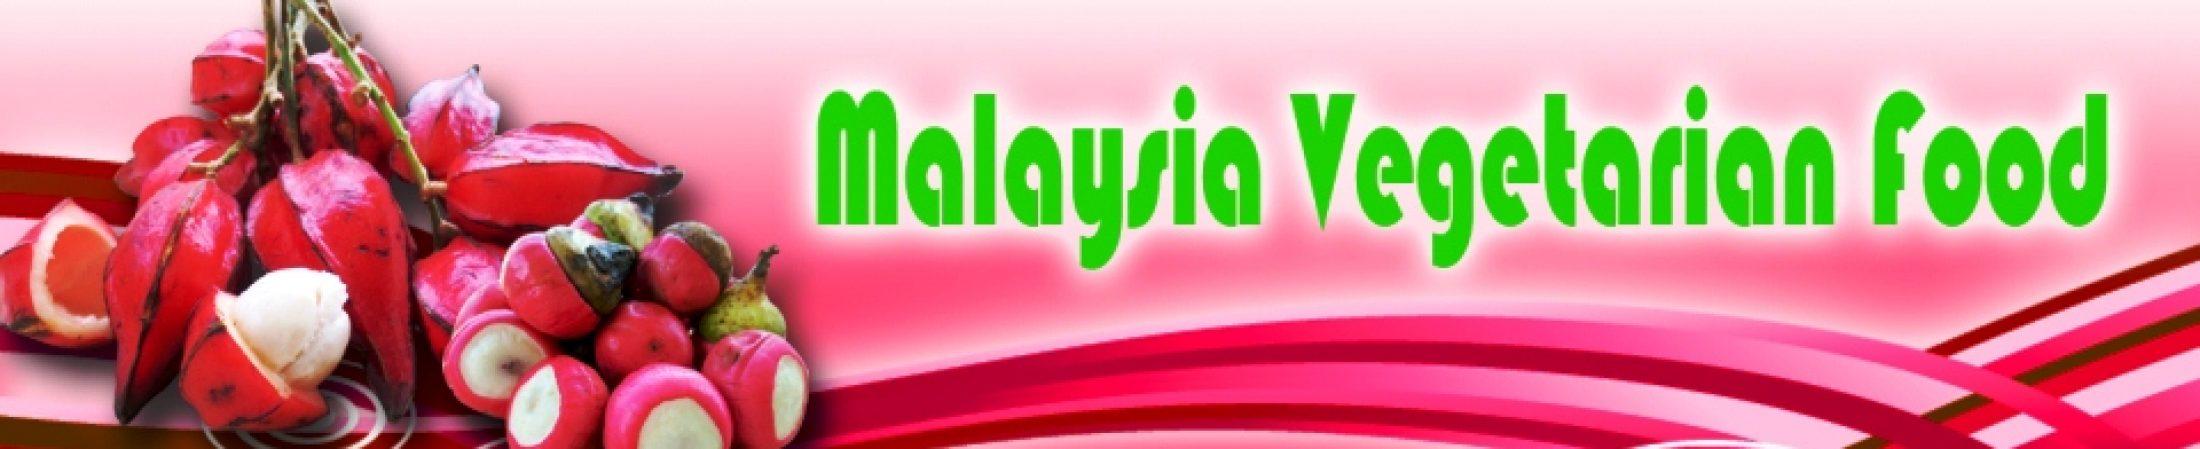 Malaysia Vegetarian Food